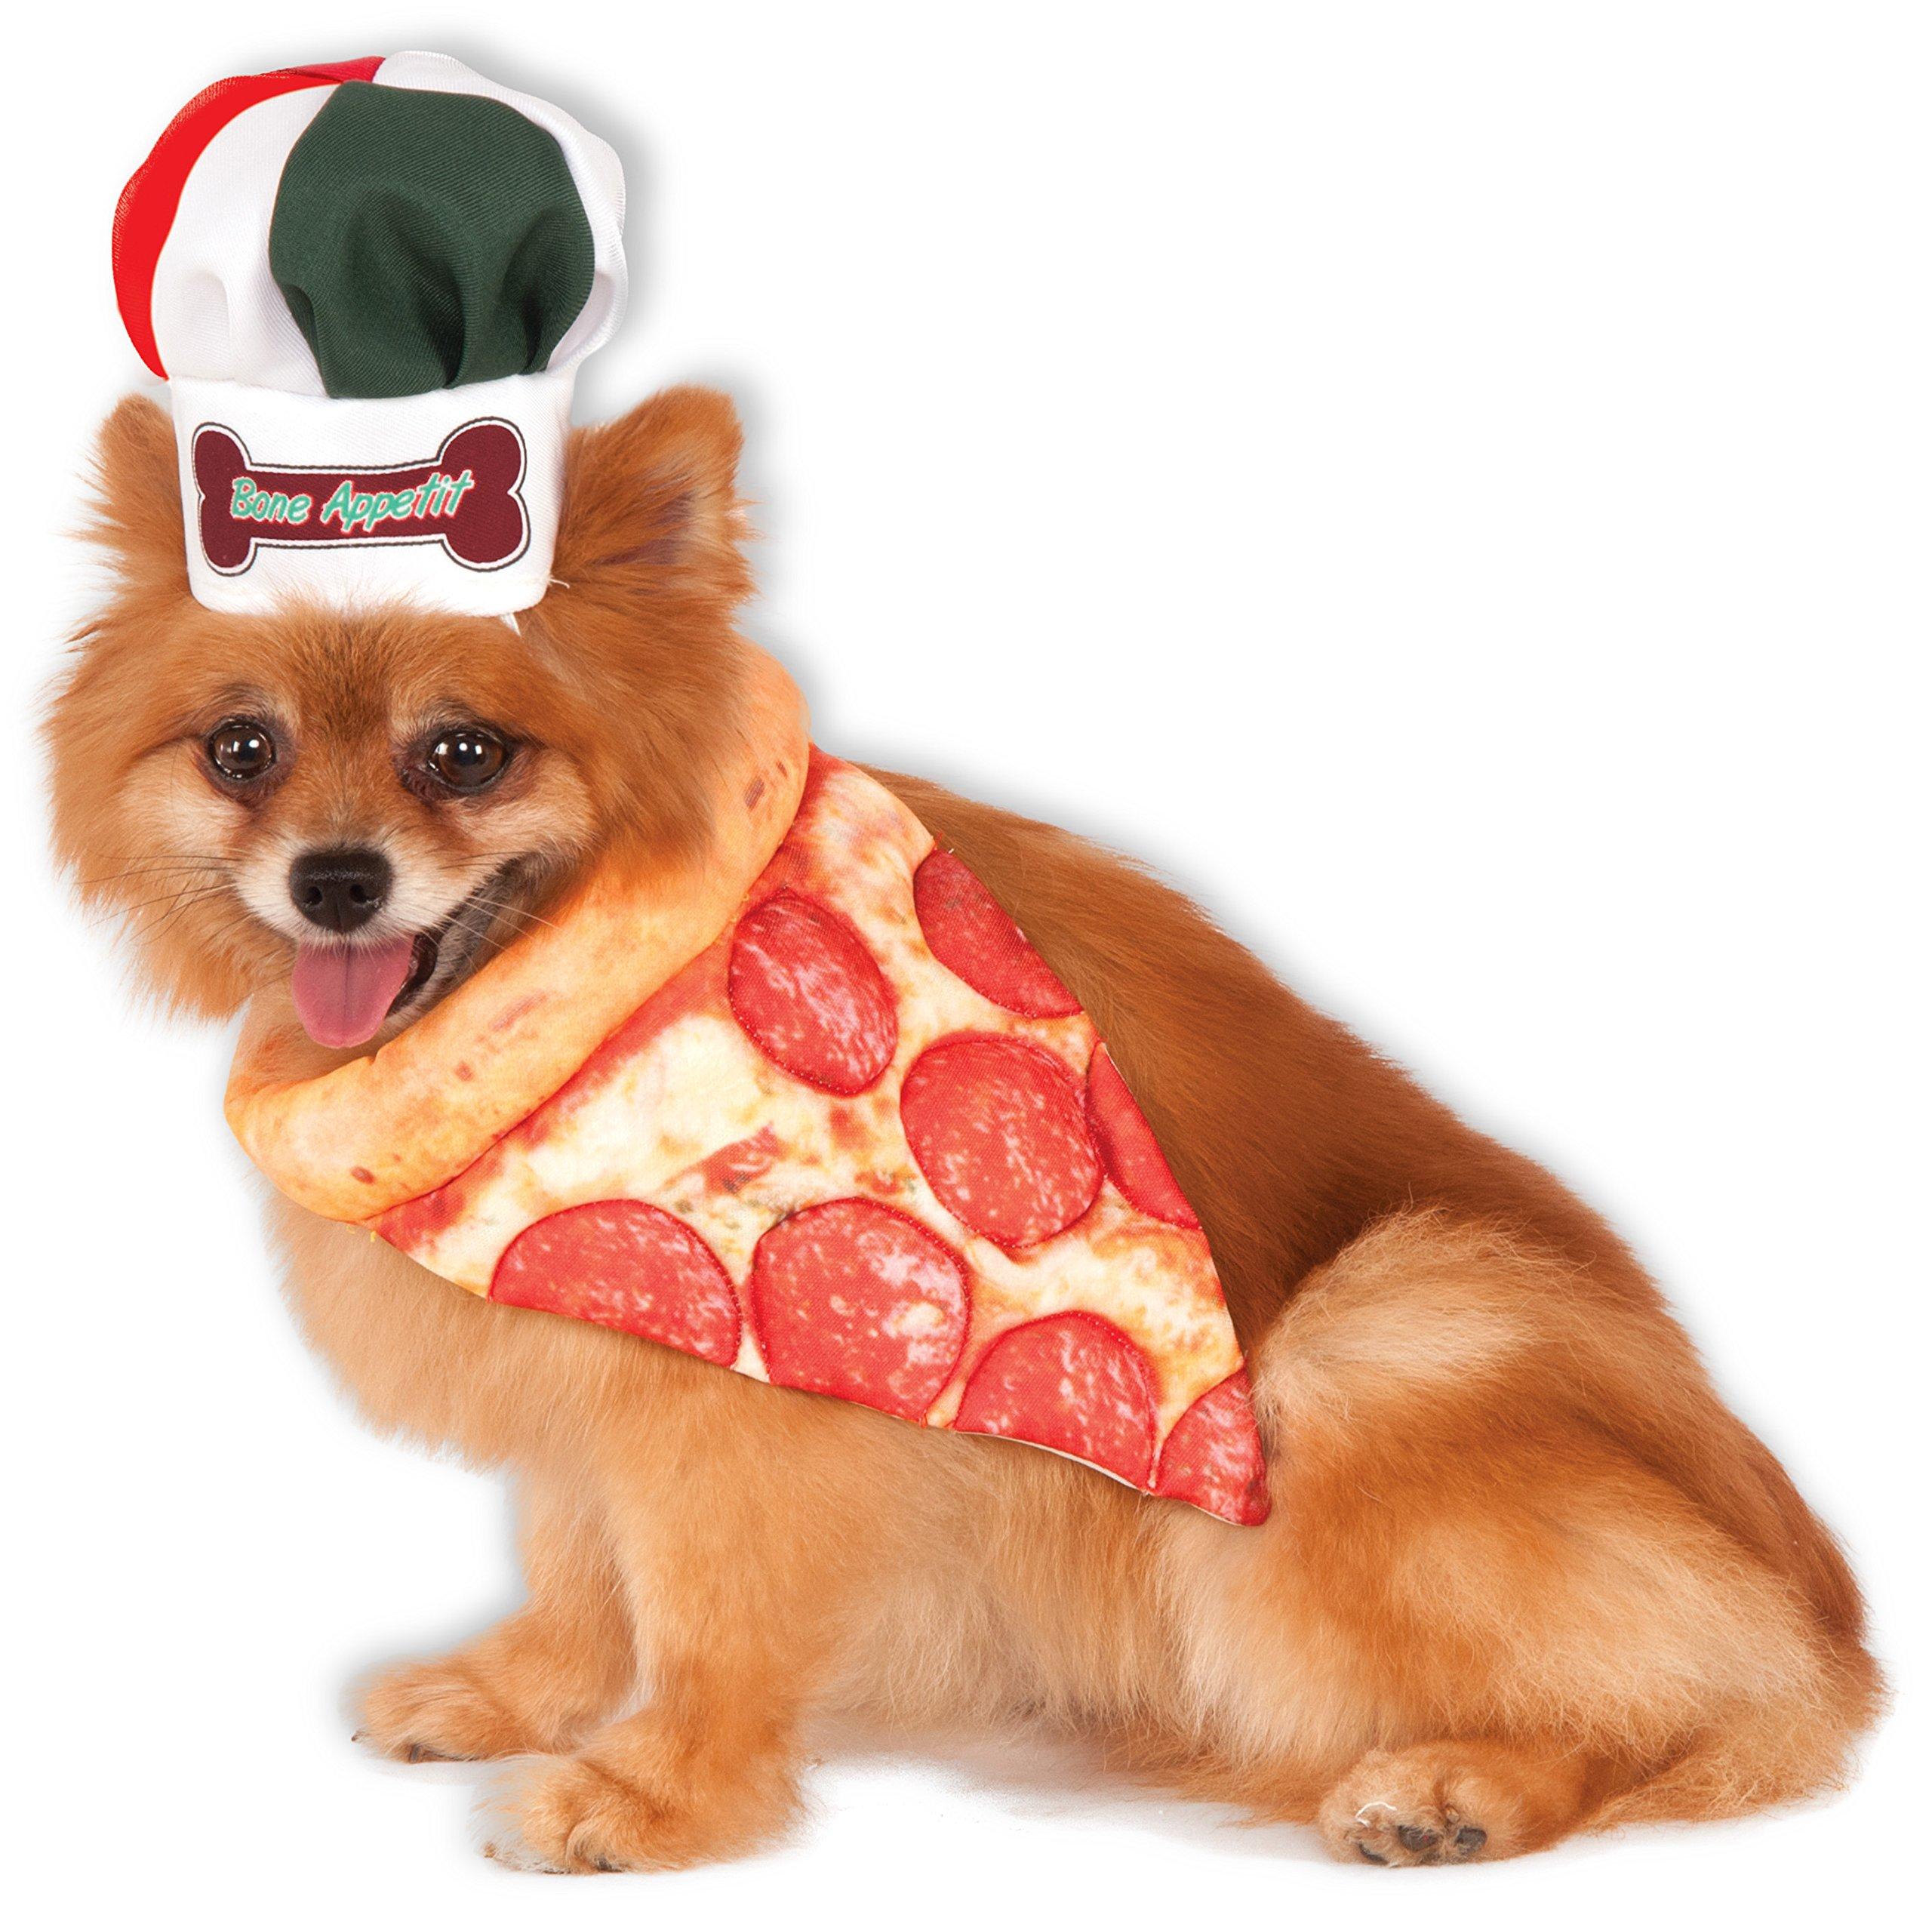 Bone Appetite Pizza Chef Pet Set, Medium/Large by Rubie's